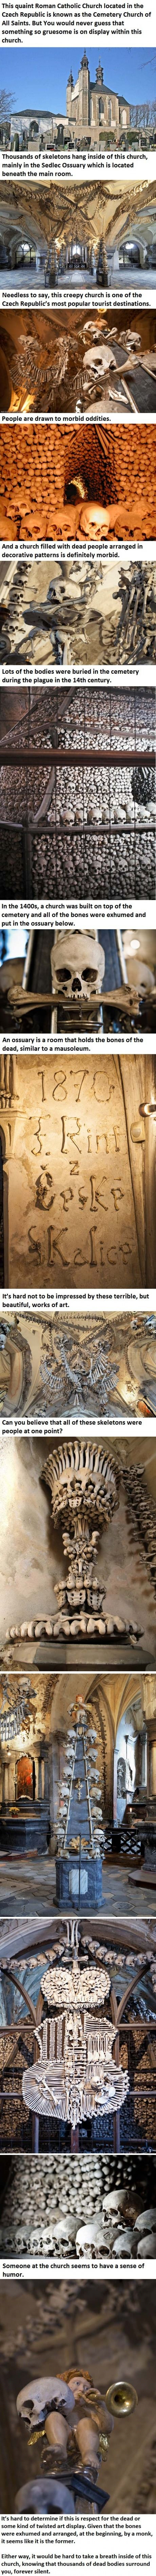 Creepy church in Czech Republic. - Just DWL || The Ultimate Trolling